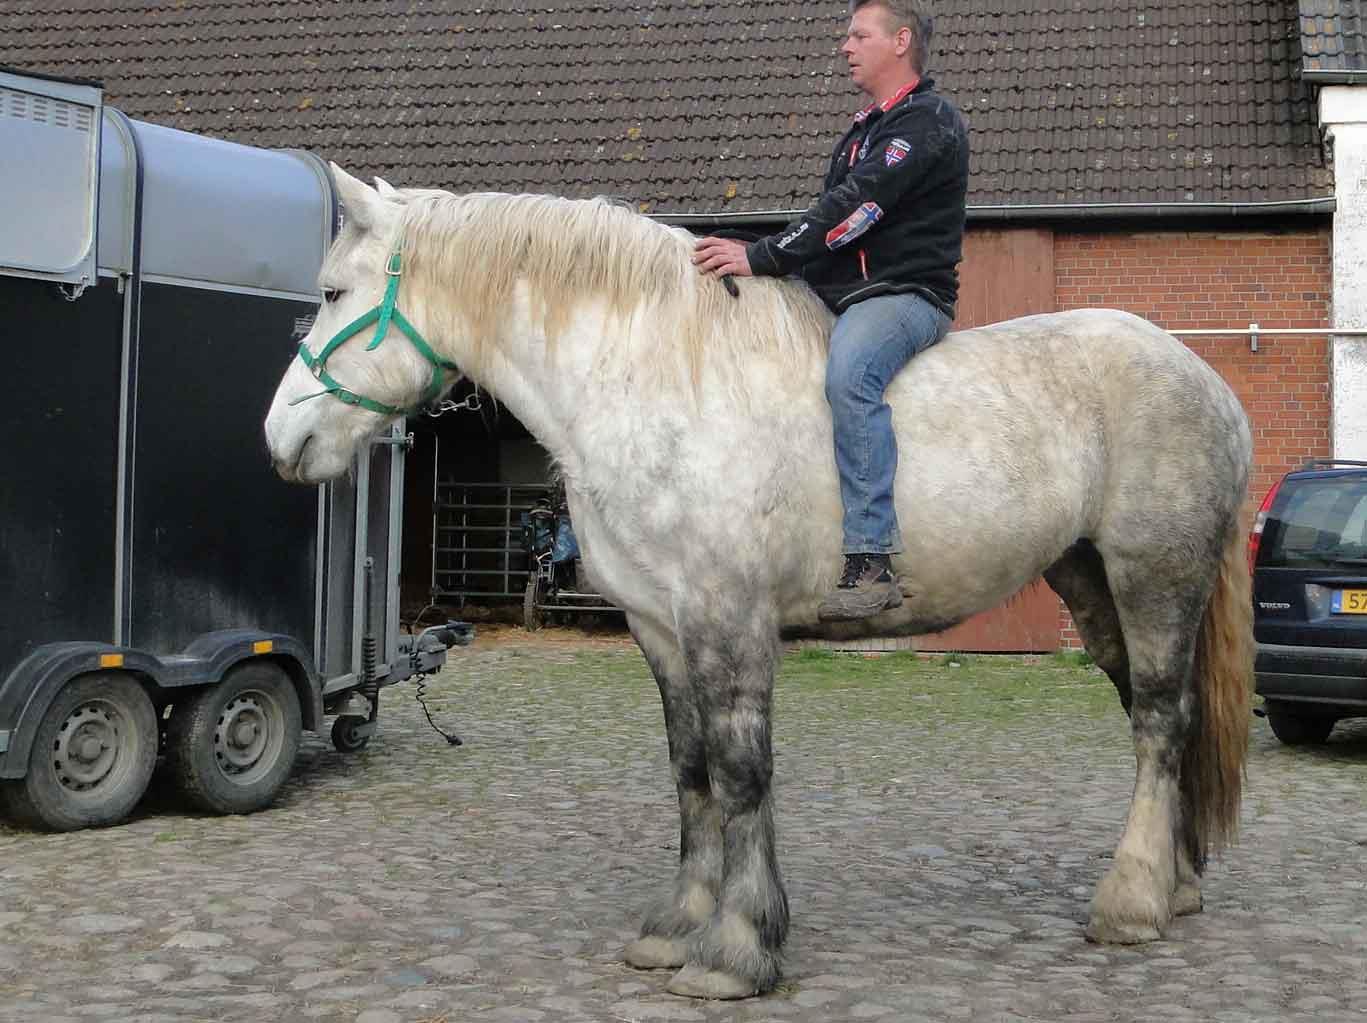 اسب نژاد پرچرون